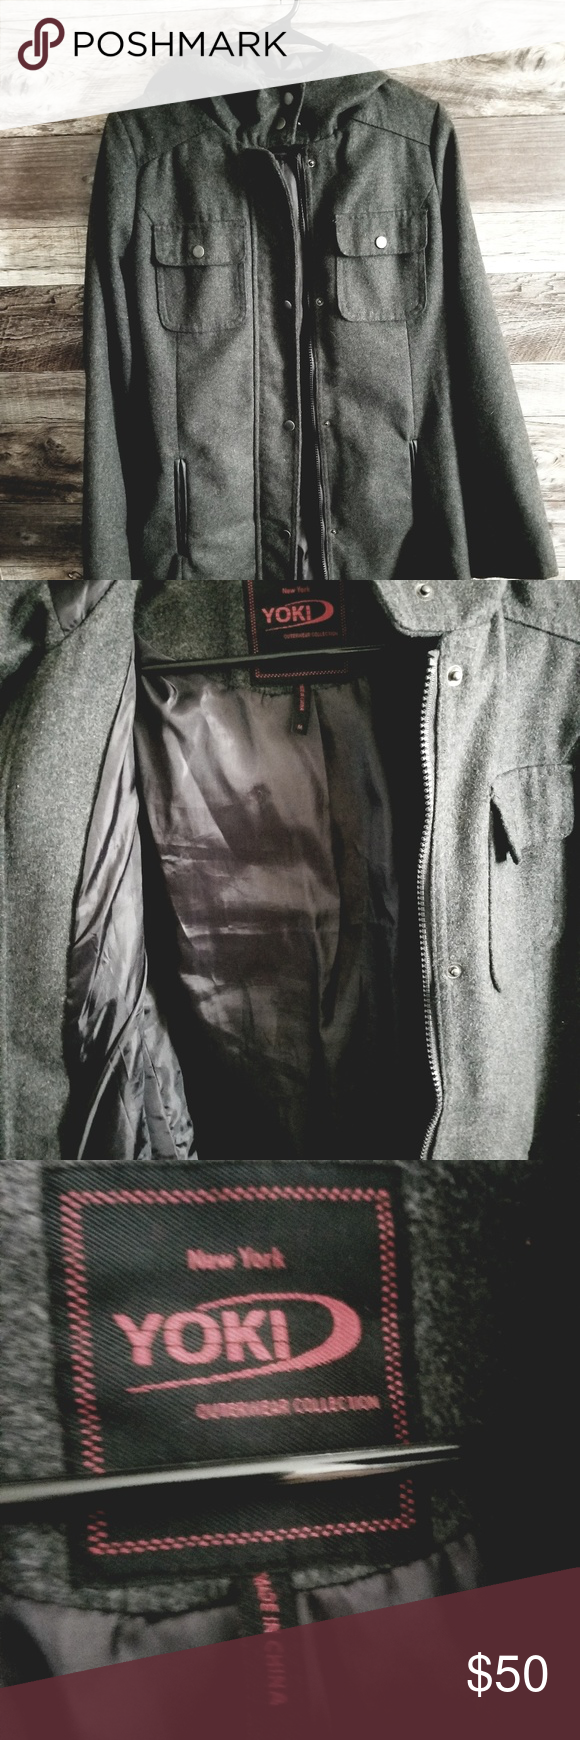 Gray Beltedzipper Front Jacket W Pockets Coats For Women Colorful Coat Clothes Design [ 1740 x 580 Pixel ]